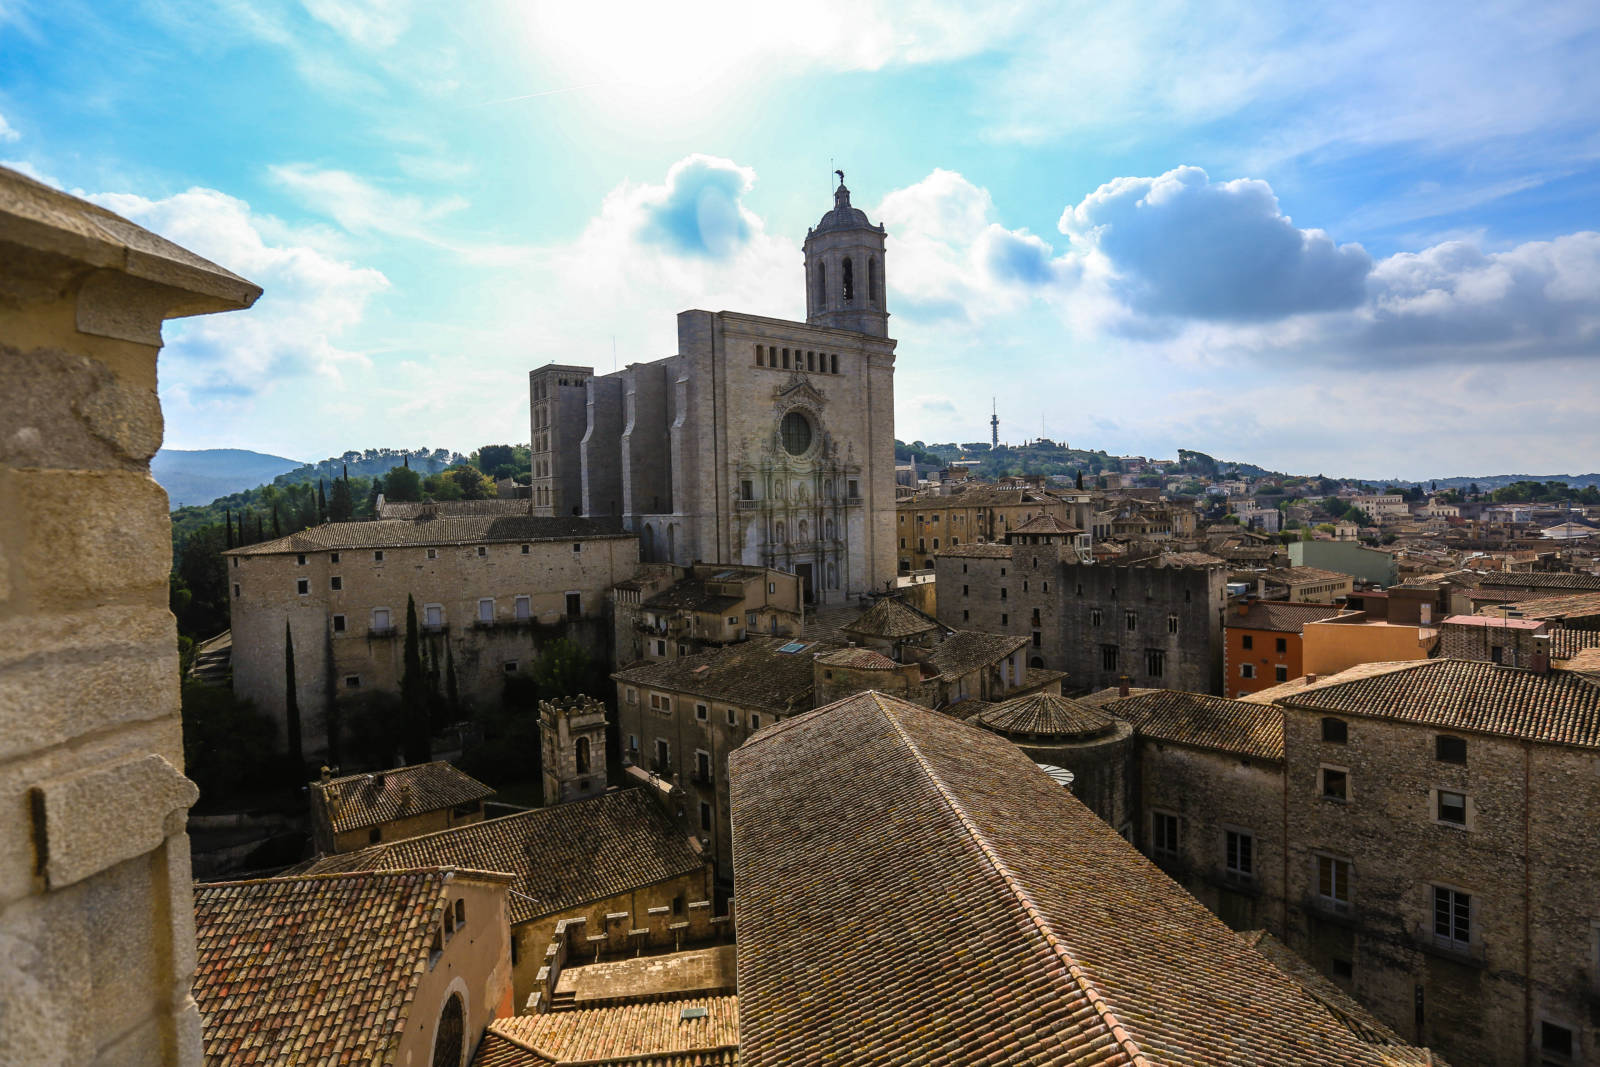 Die Kathedrale von Girona © JD Andrews - Arxiu Imatges PTCBG